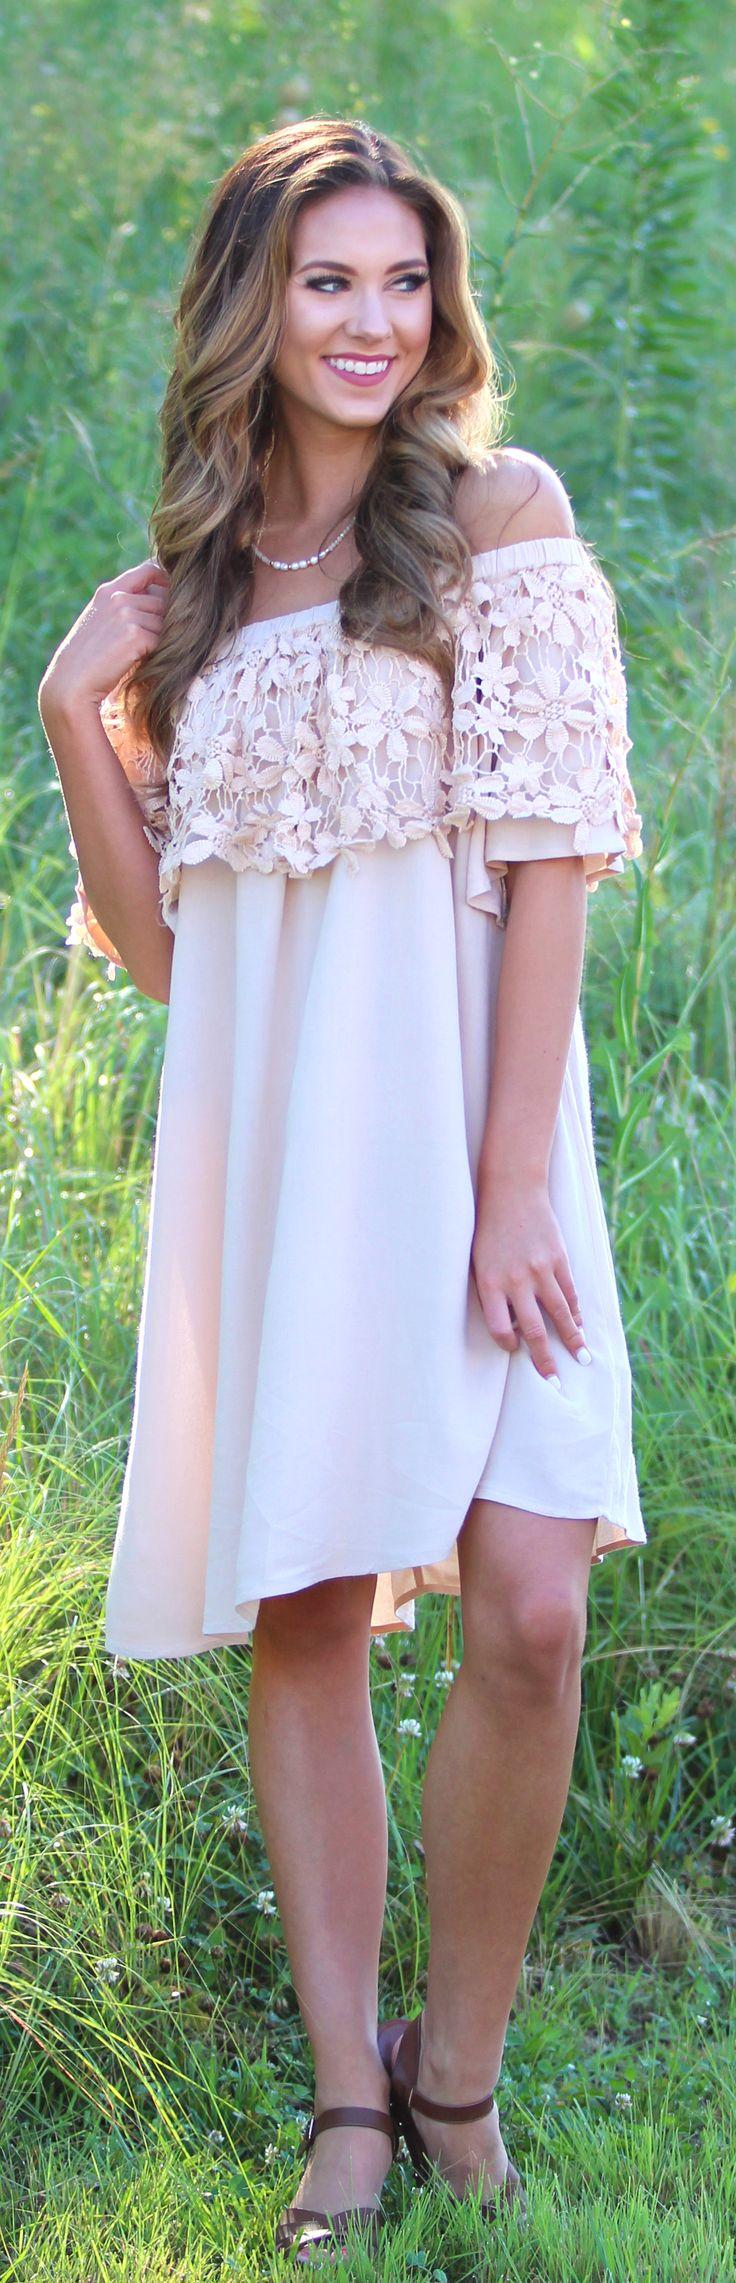 Sands Of Time Dress | Monday Dress Boutique